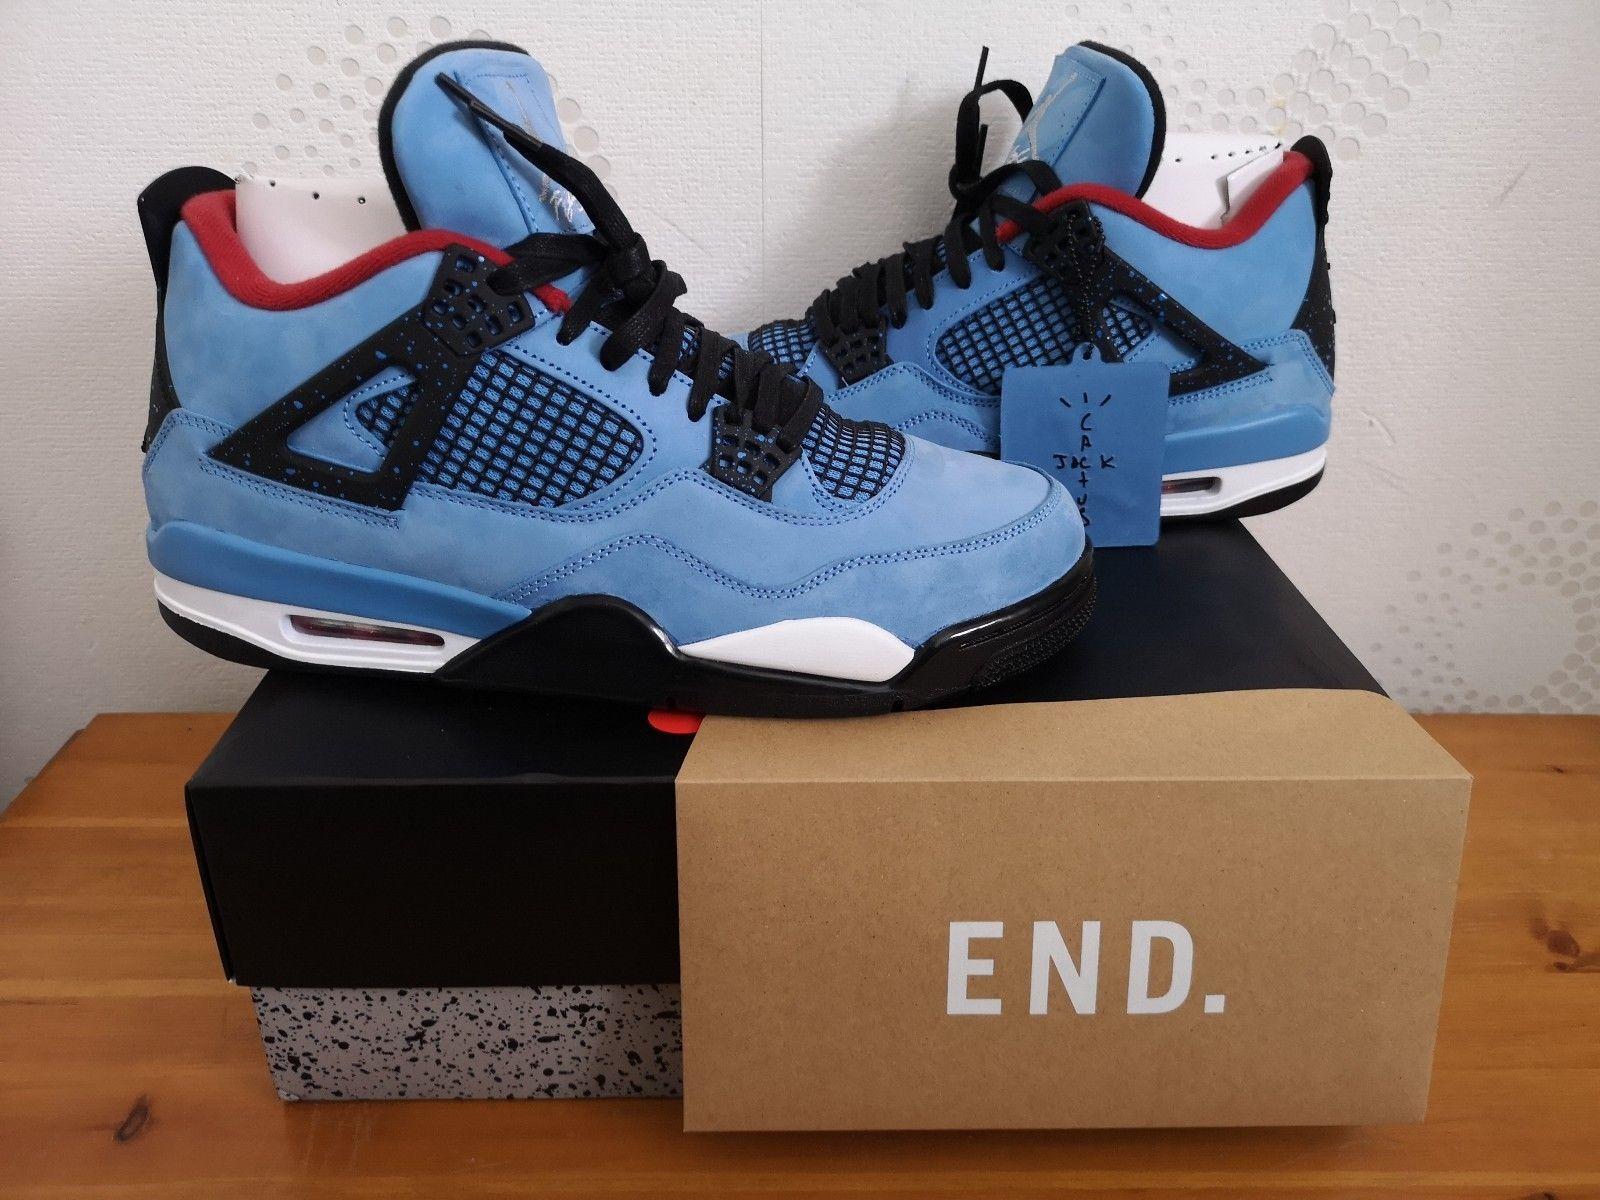 Nike Air Jordan 4 Retro X Travis Scott Cactus Jack With Receipt